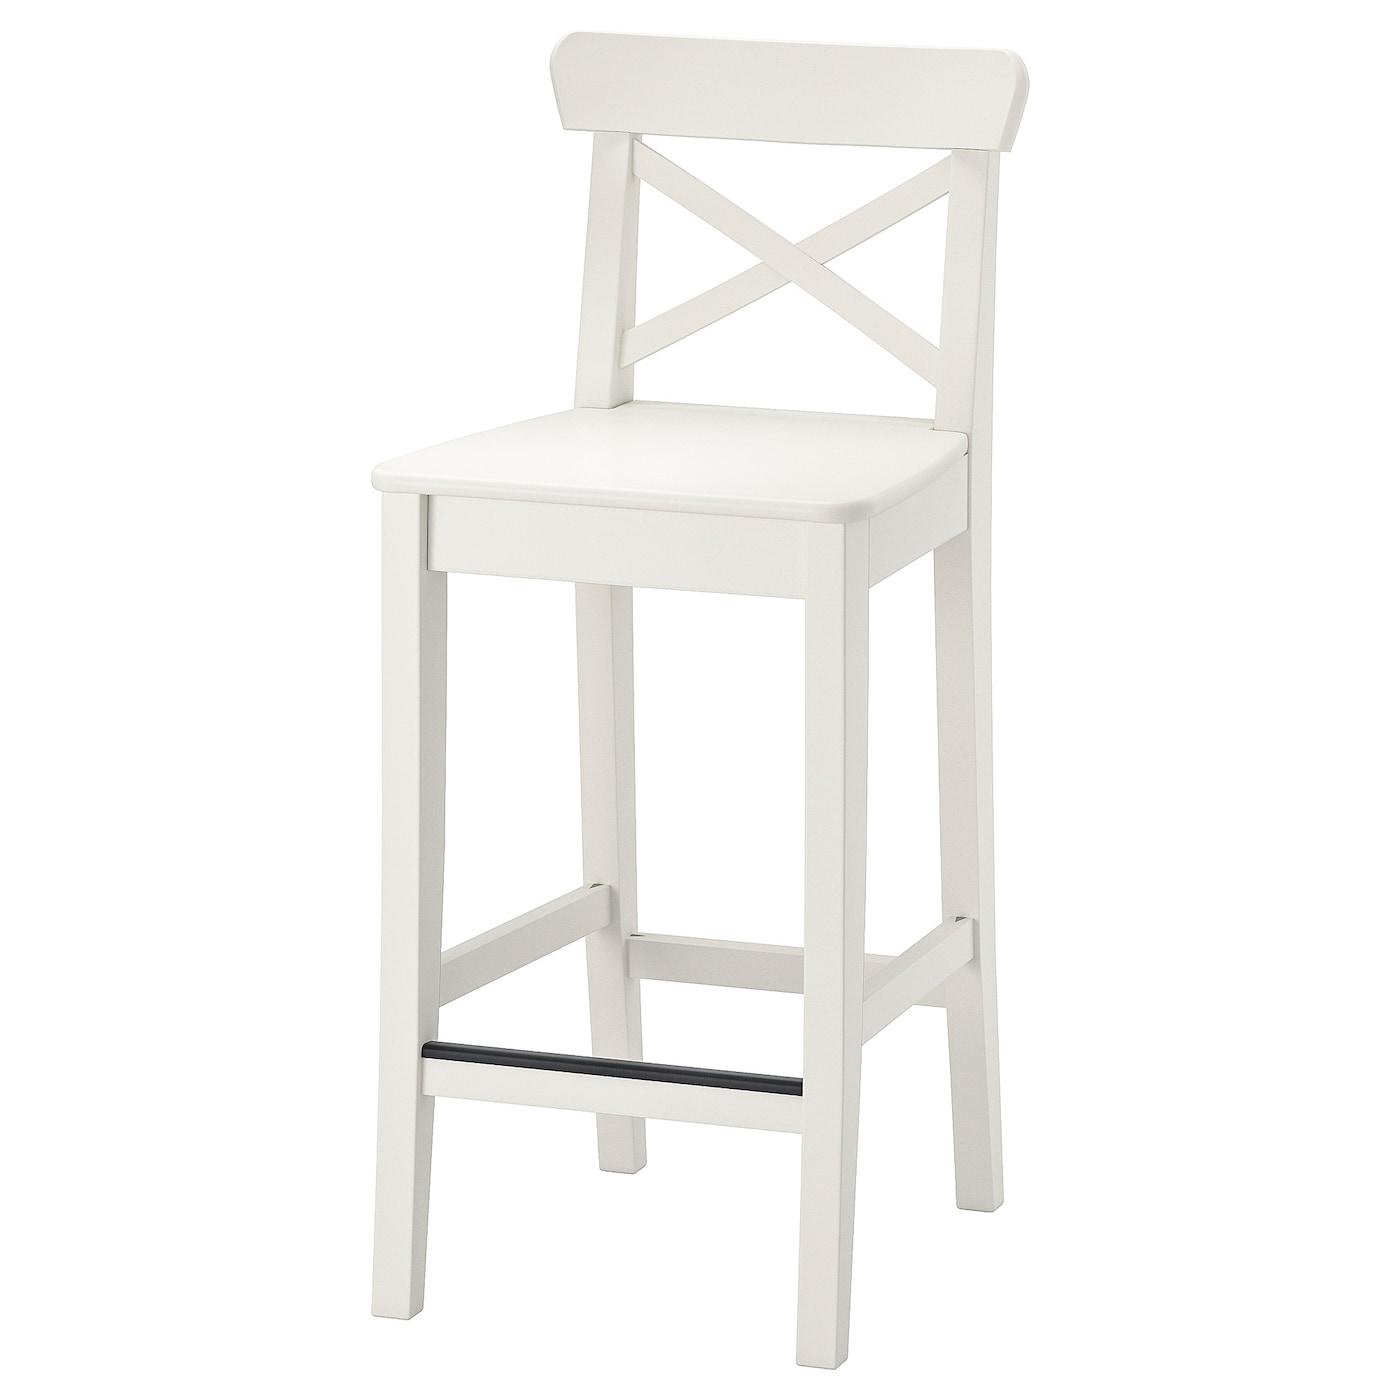 Bar Stools   Kitchen Stools   Bar Chairs   IKEA